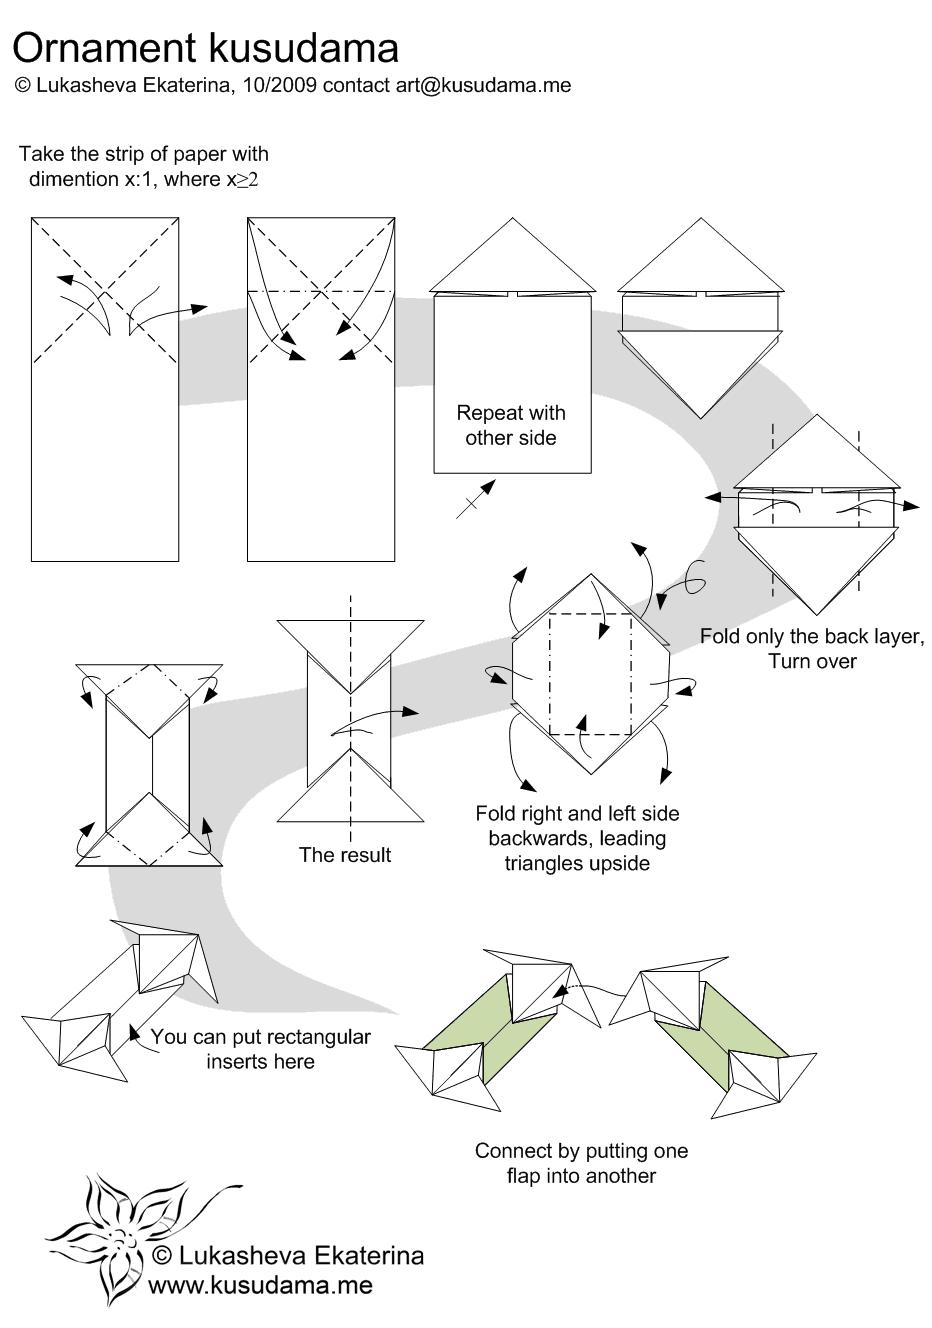 Diagram for ornament kusudama origami and papercrafts diagram for ornament kusudama pooptronica